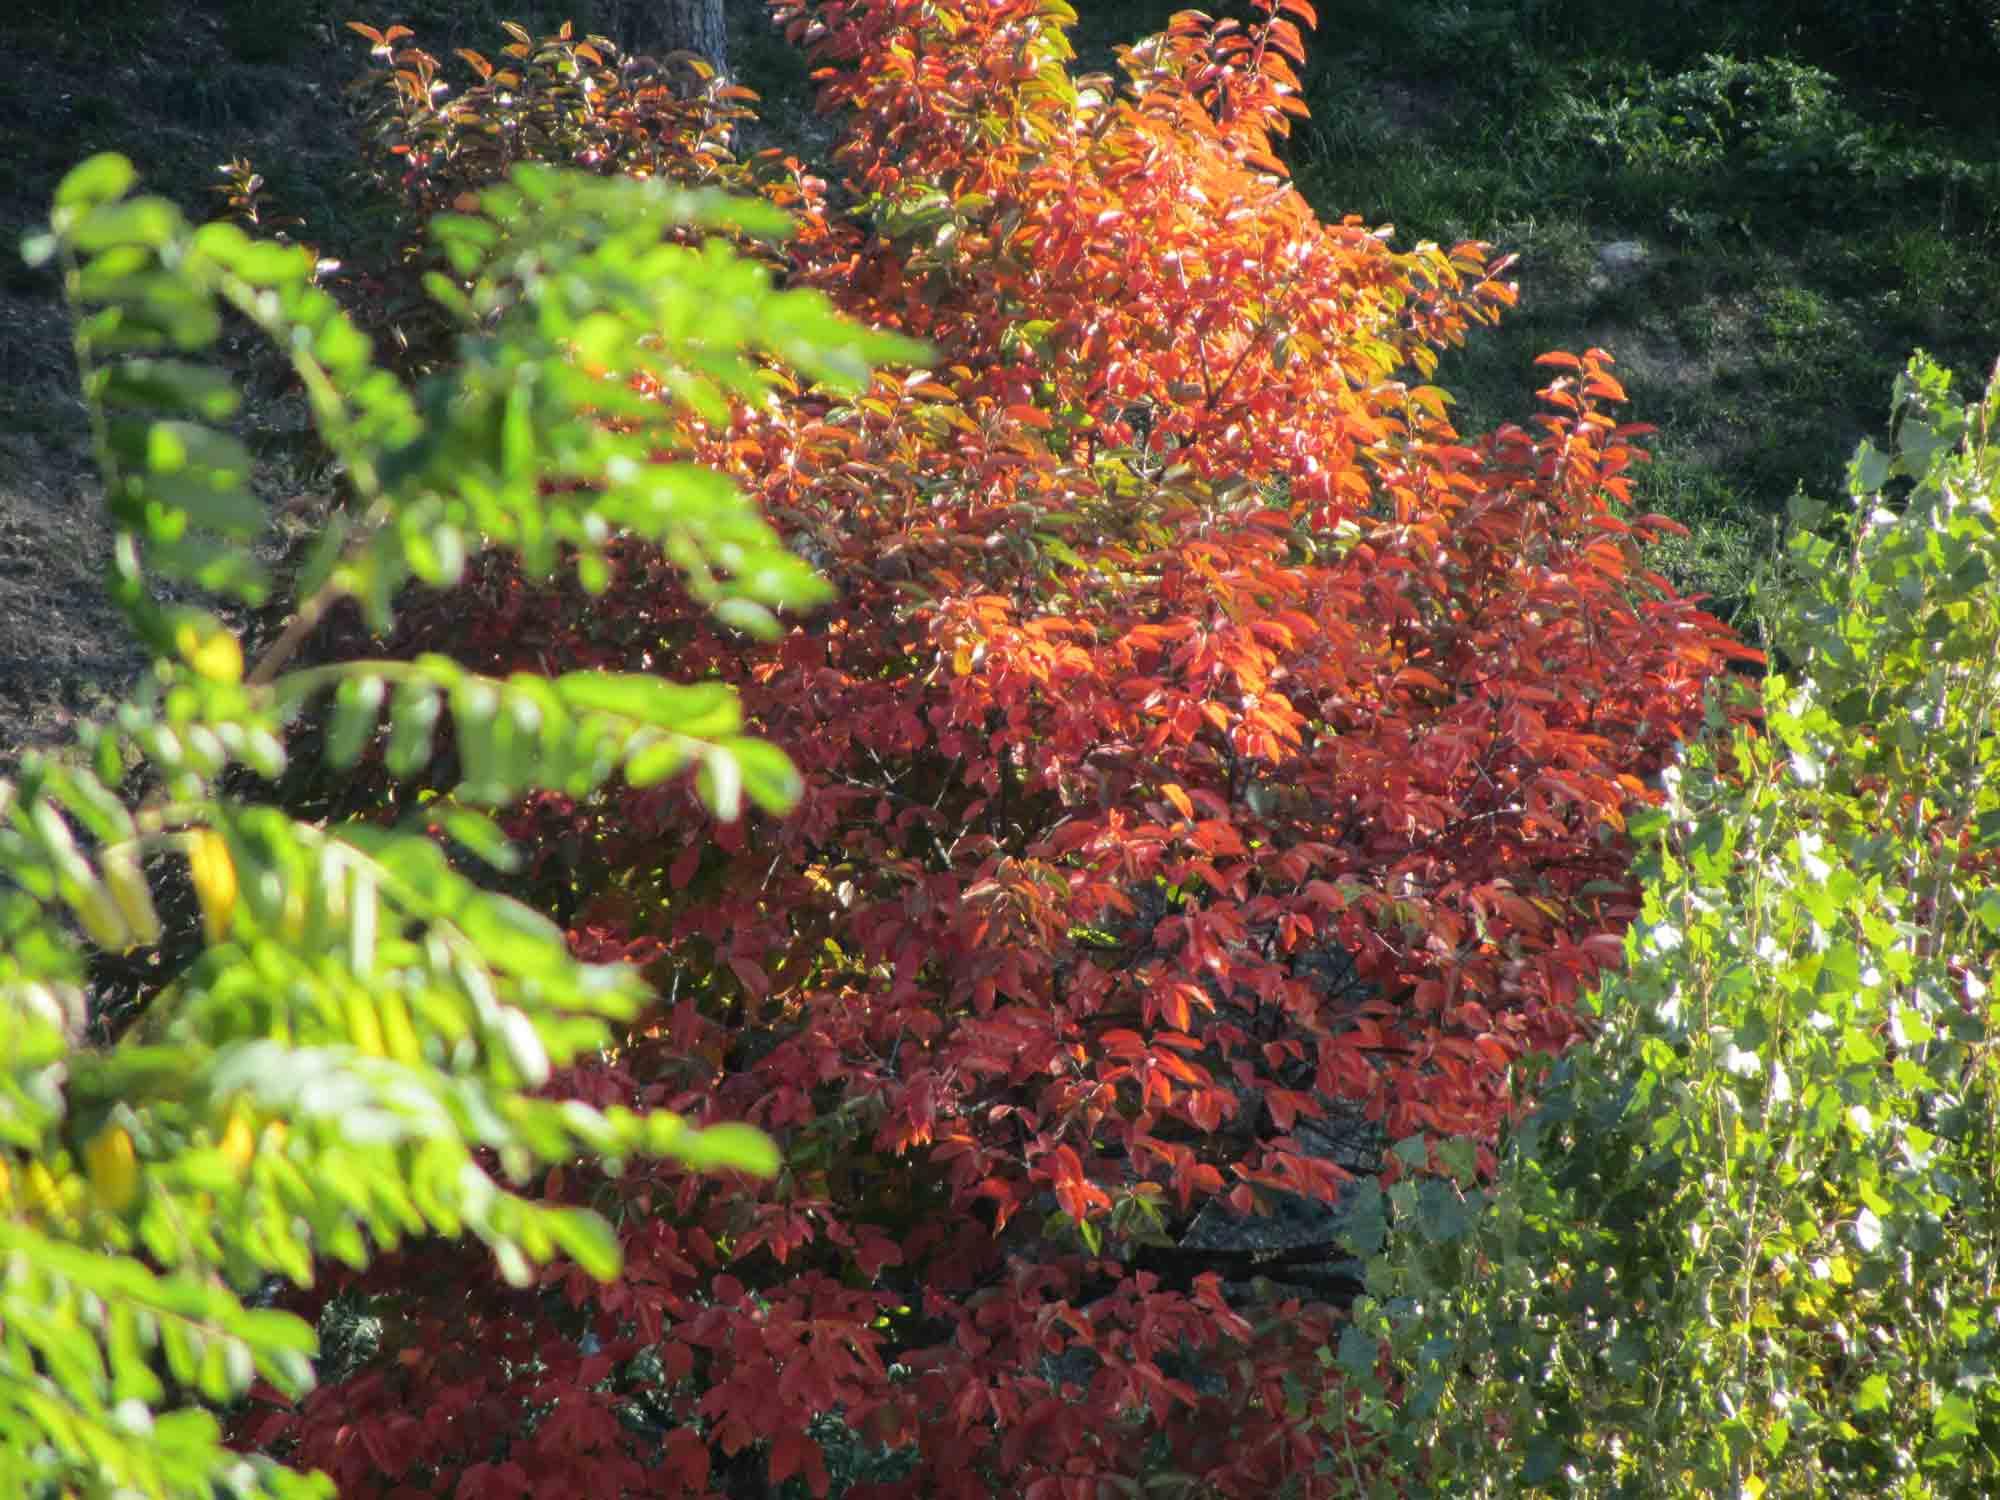 albero dalle foglie rosse forum natura mediterraneo